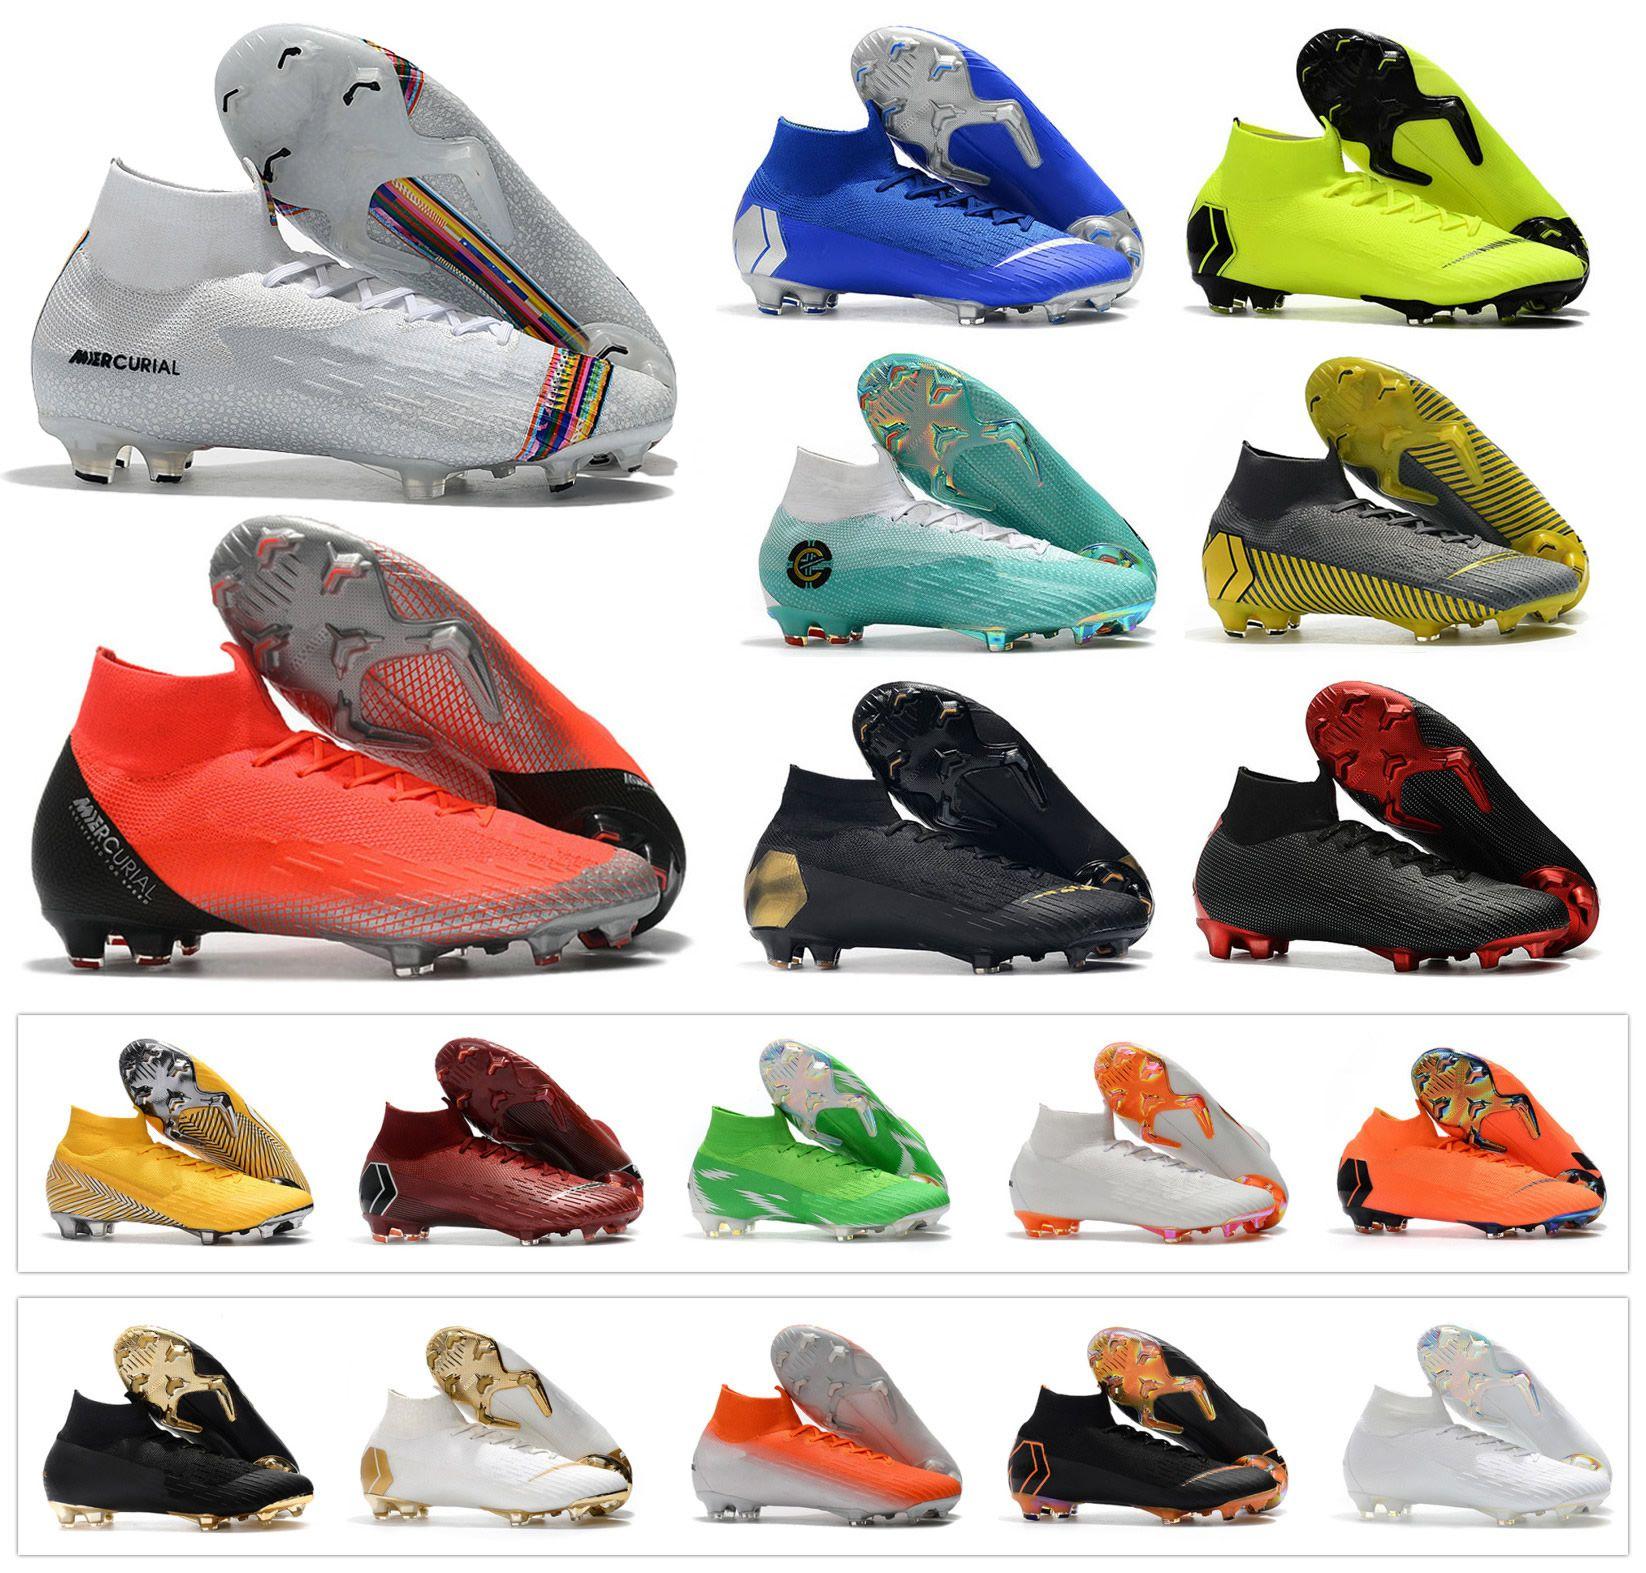 a4deb9f48 2019 2019 Mercurial Superfly VI 360 Elite FG KJ 6 XII 12 CR7 Ronaldo Neymar  Mens Women Boys Soccer Shoes Football Boots Cleats Size US 3 11 From  Themaxshoes ...